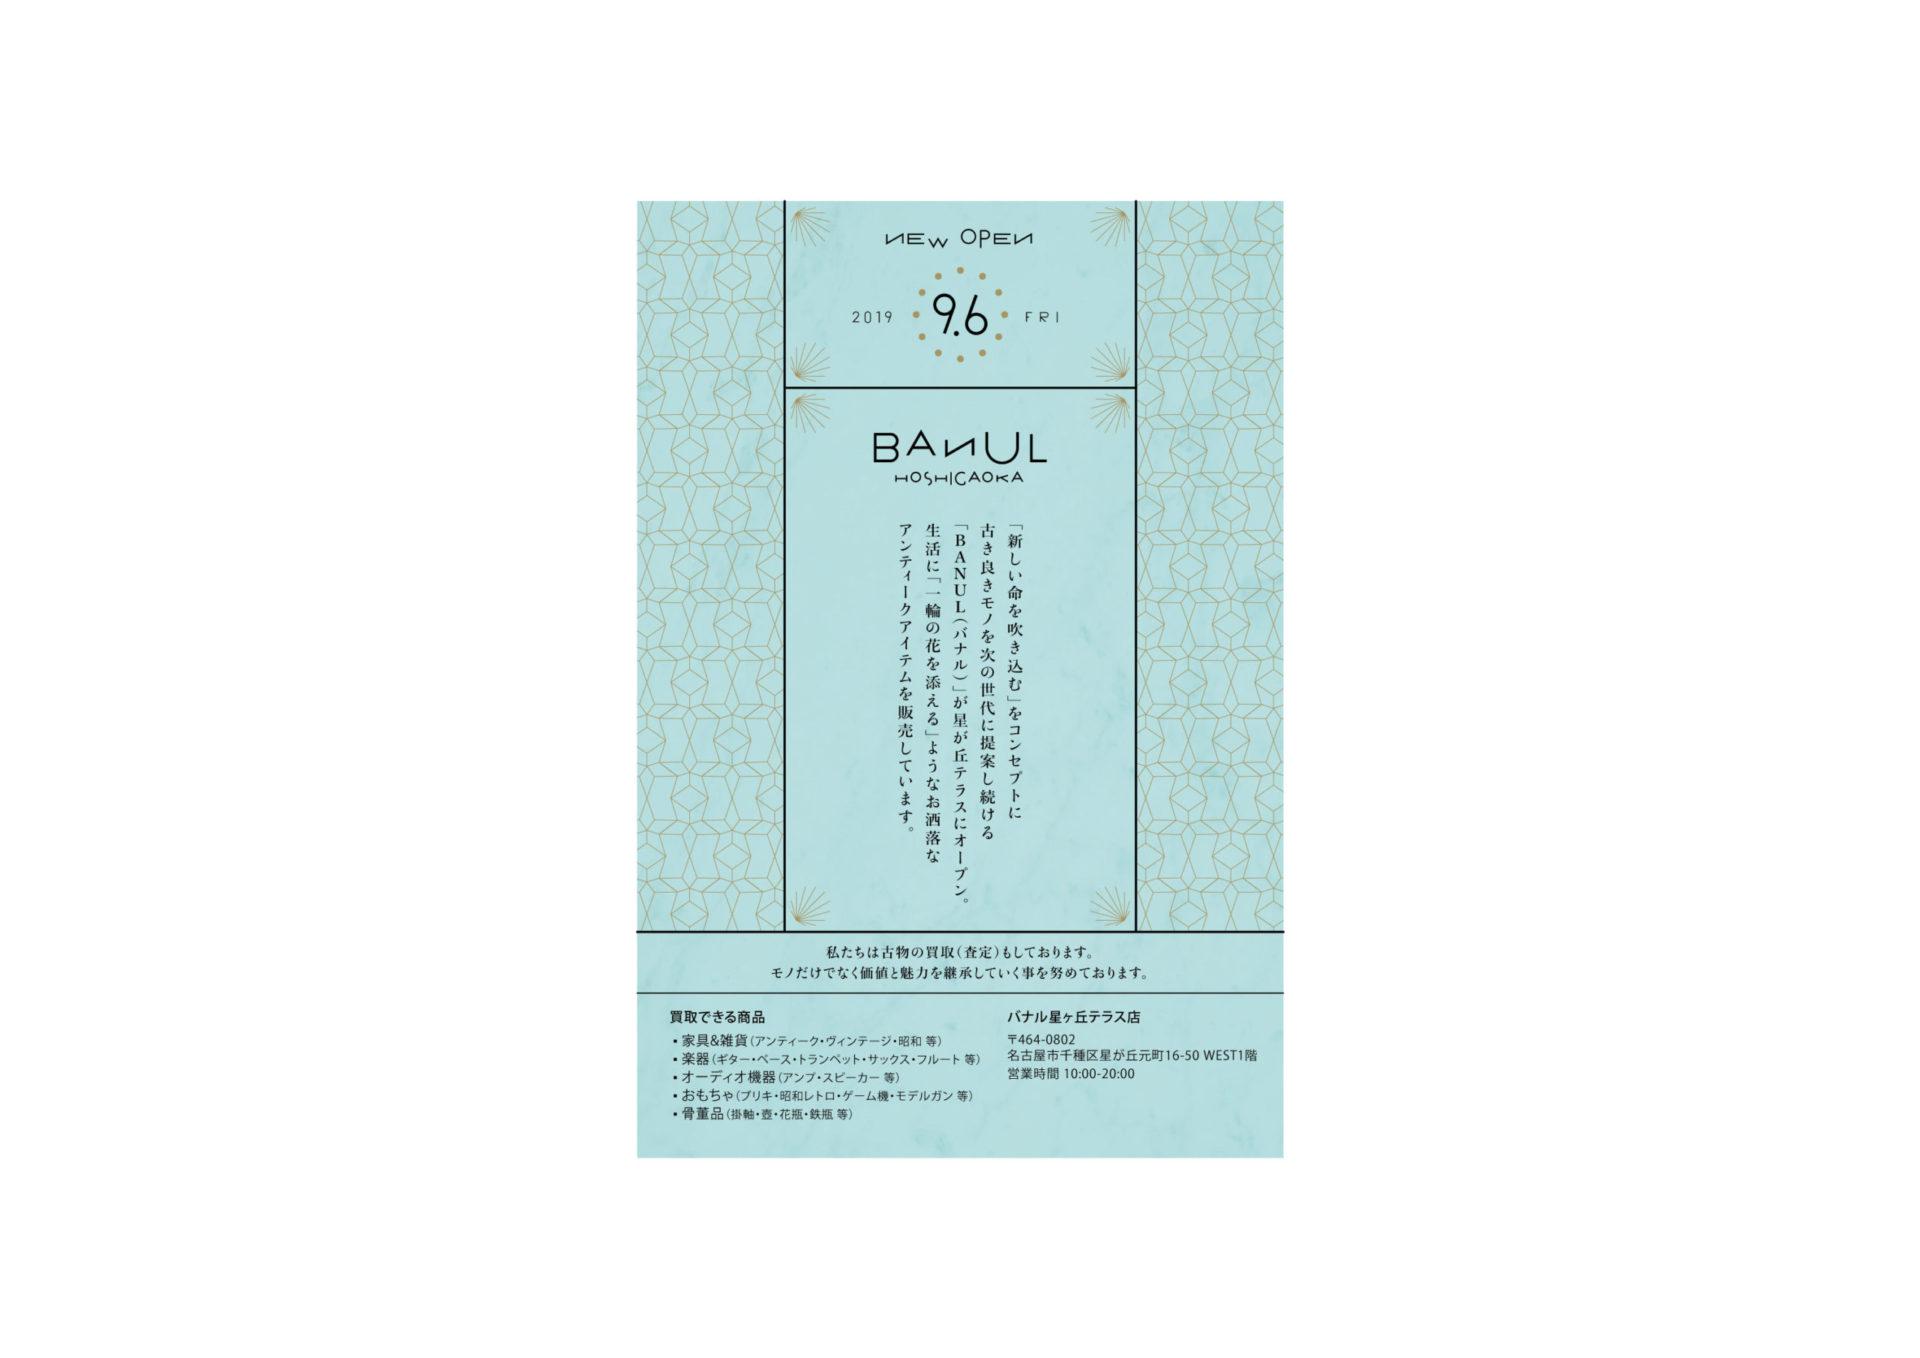 BANUL星ヶ丘店 ポスターデザイン